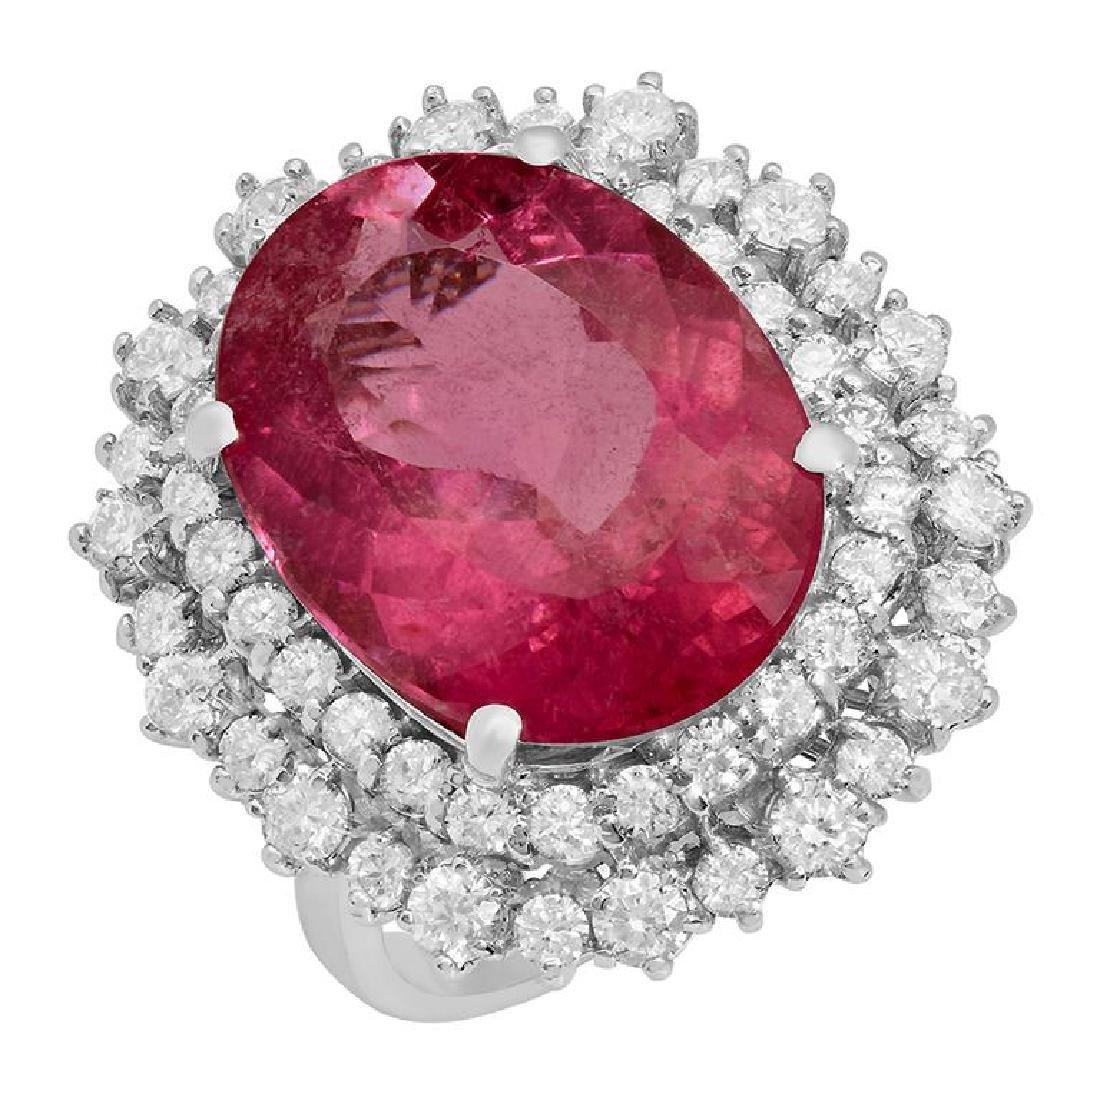 14k White Gold 10.32ct Pink Tourmaline 1.89ct Diamond